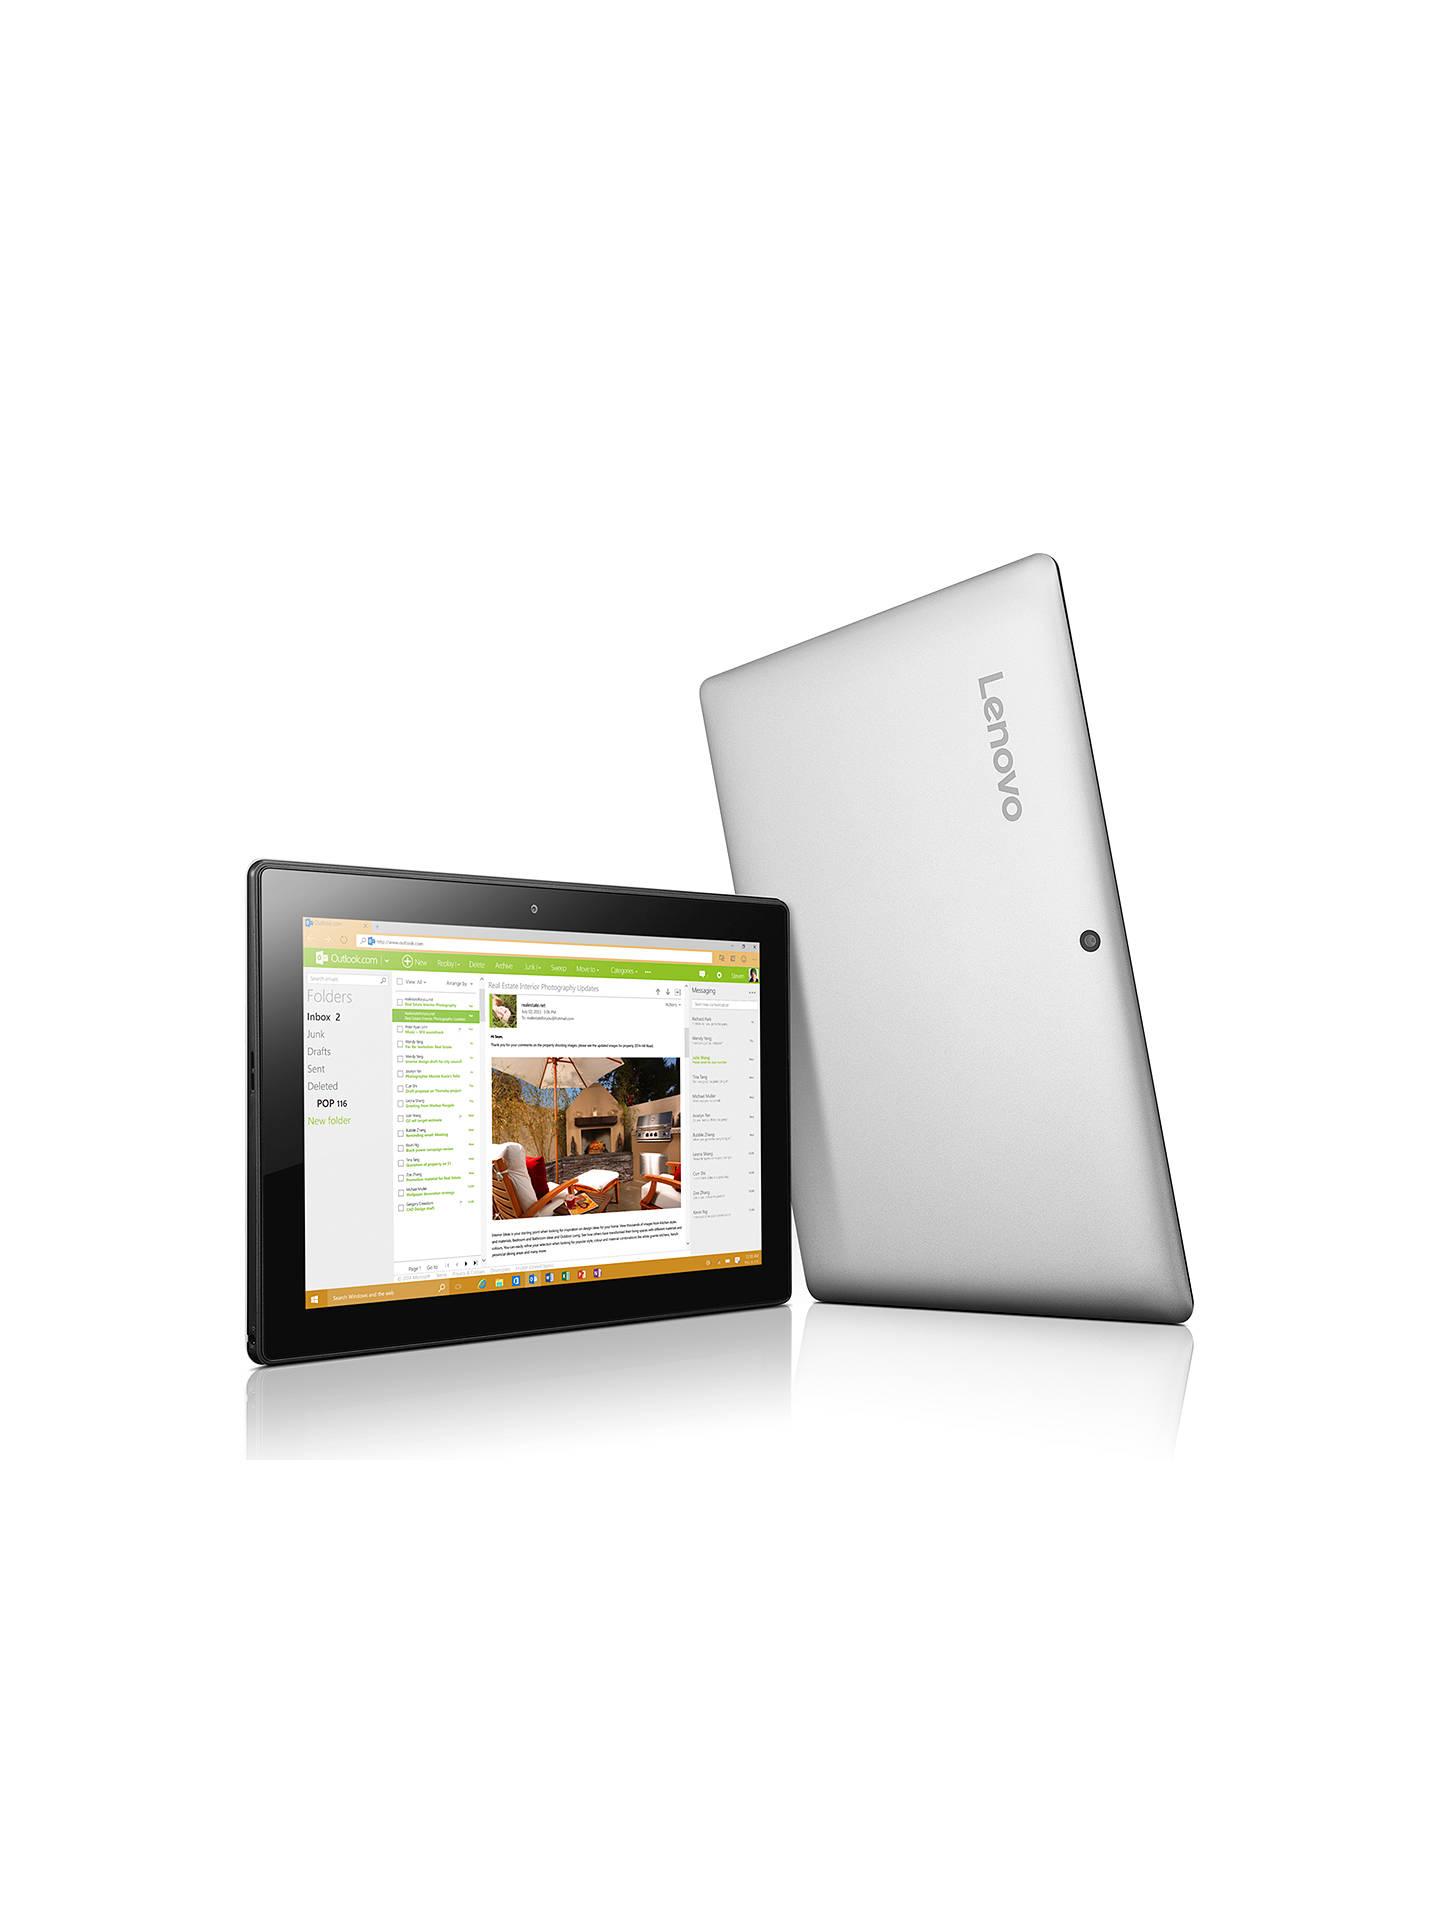 Lenovo Miix 310 Tablet with Detachable Keyboard, Intel Atom, 2GB RAM, 32GB  eMMC, 10 1